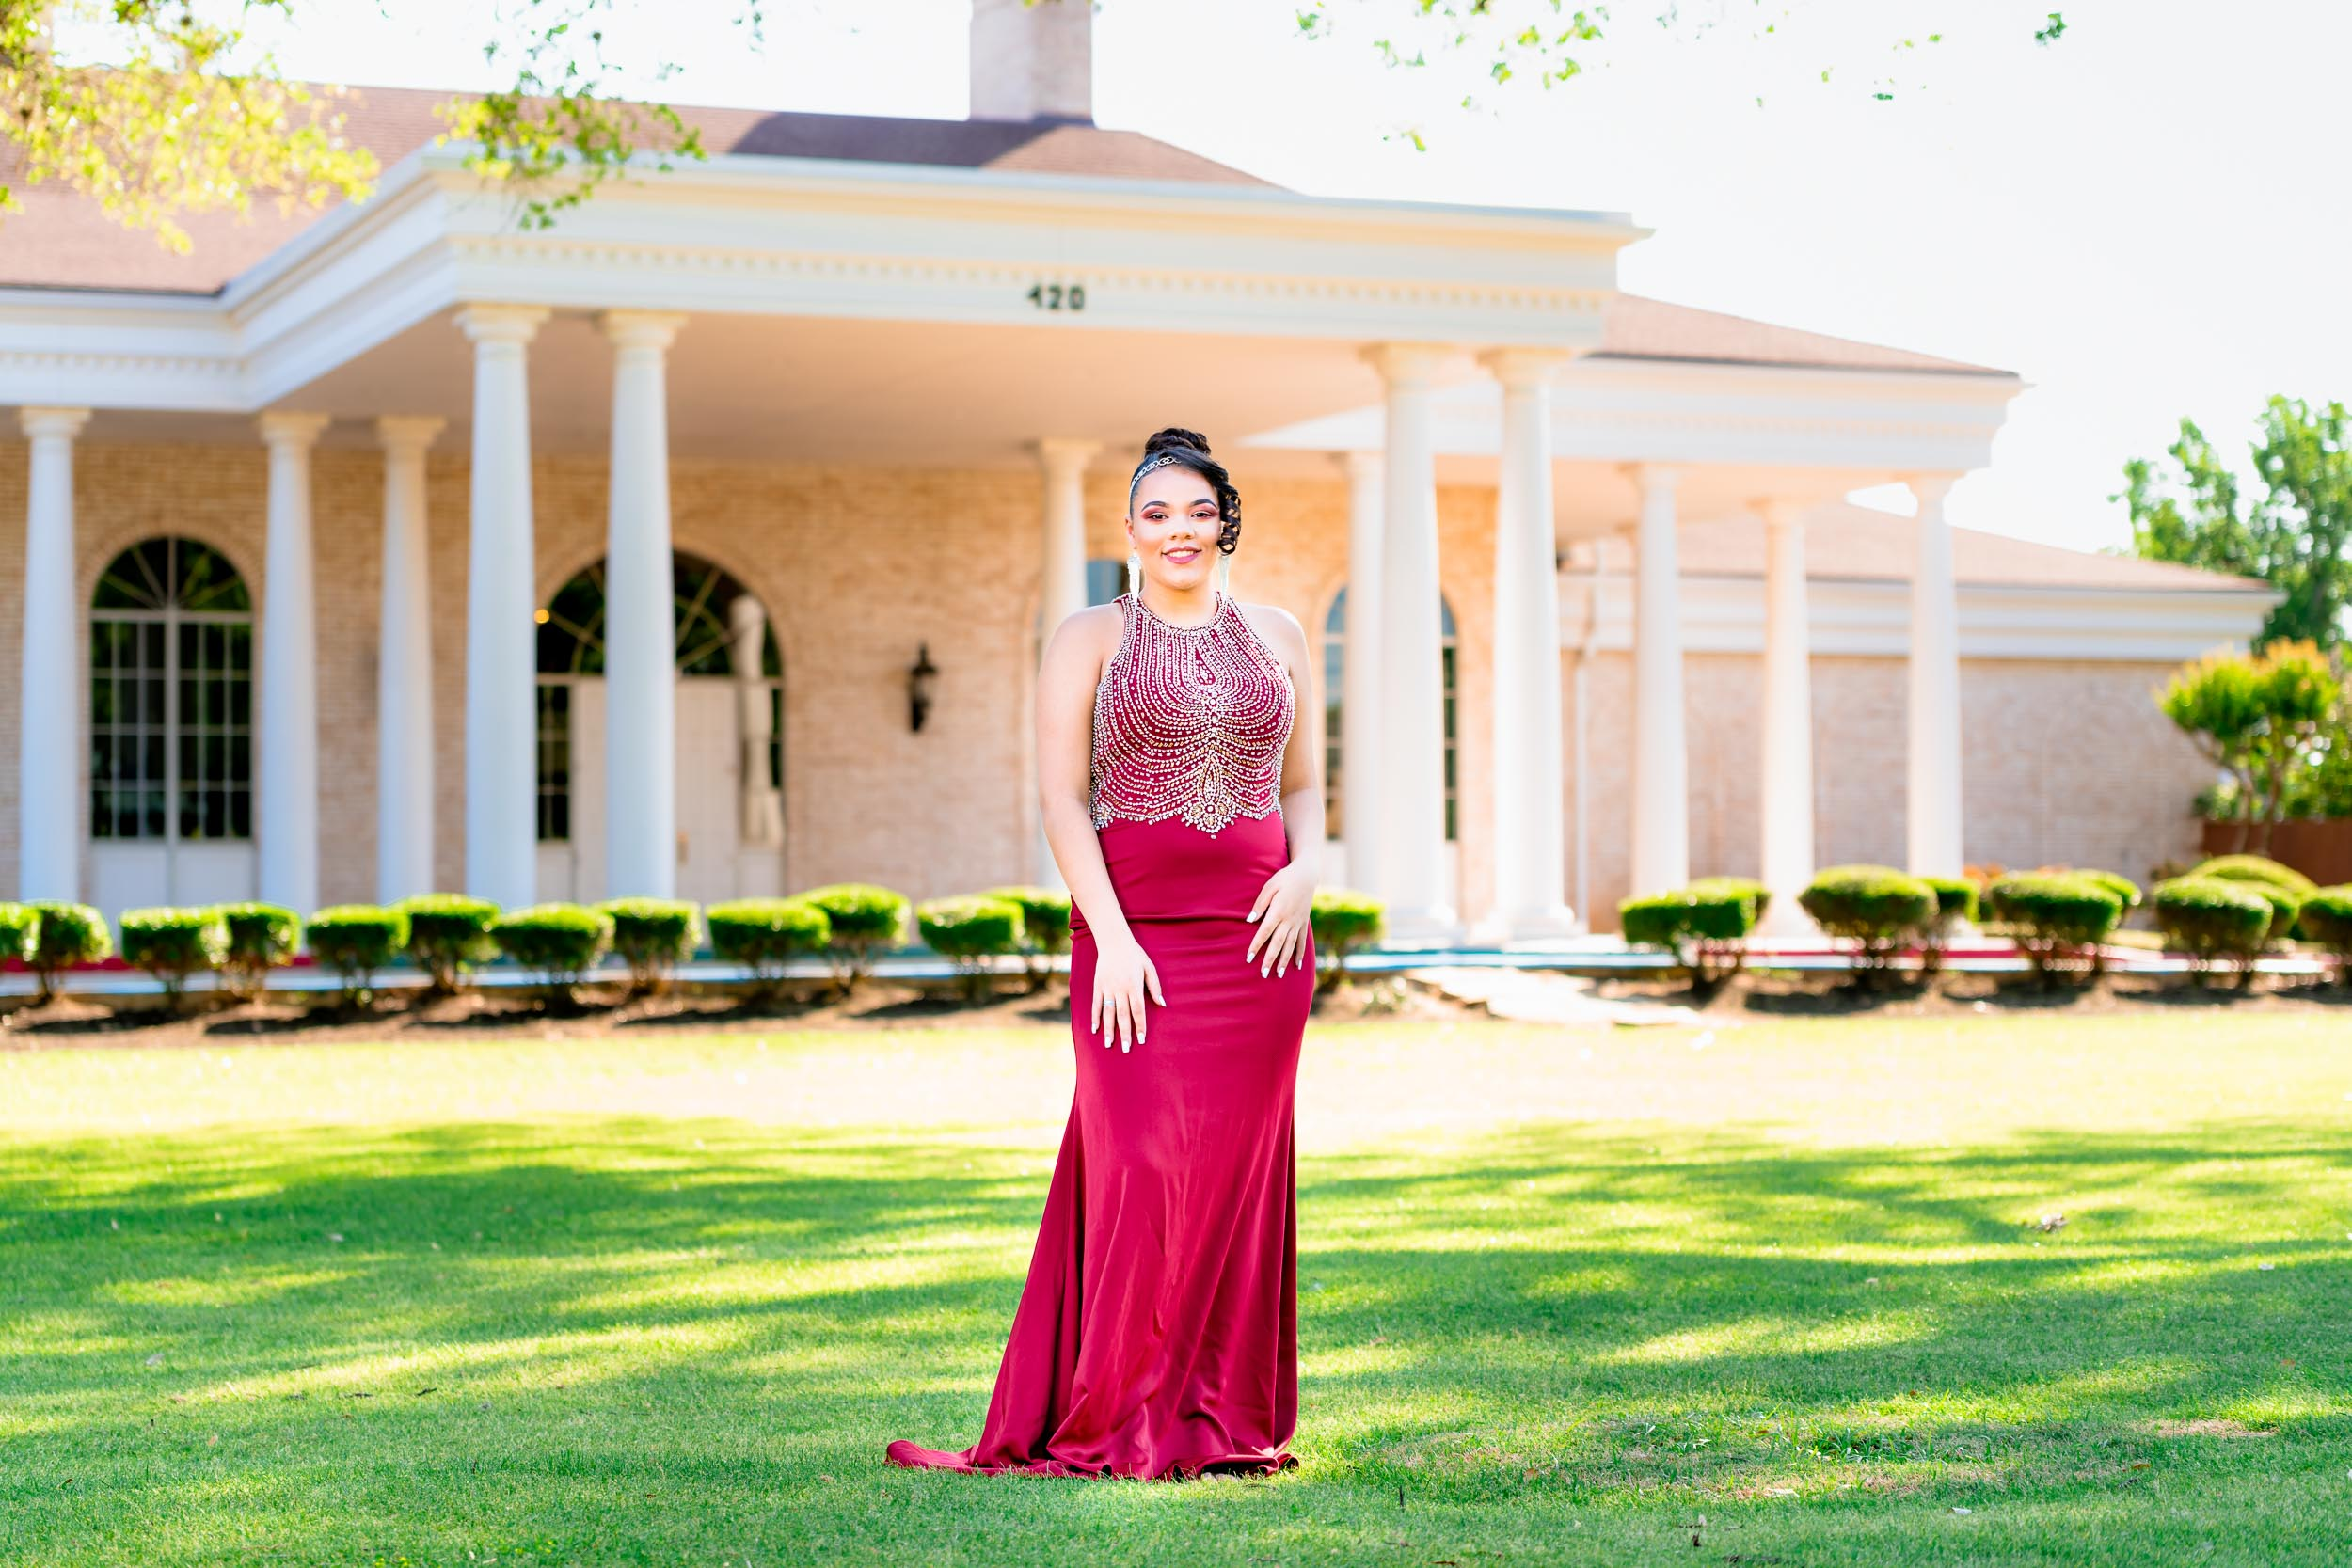 Senior Photographer Portrait Photographer Graduate Photographer College Graduate Photographer Houston Sugar Land Missouri City Sienna Plantation